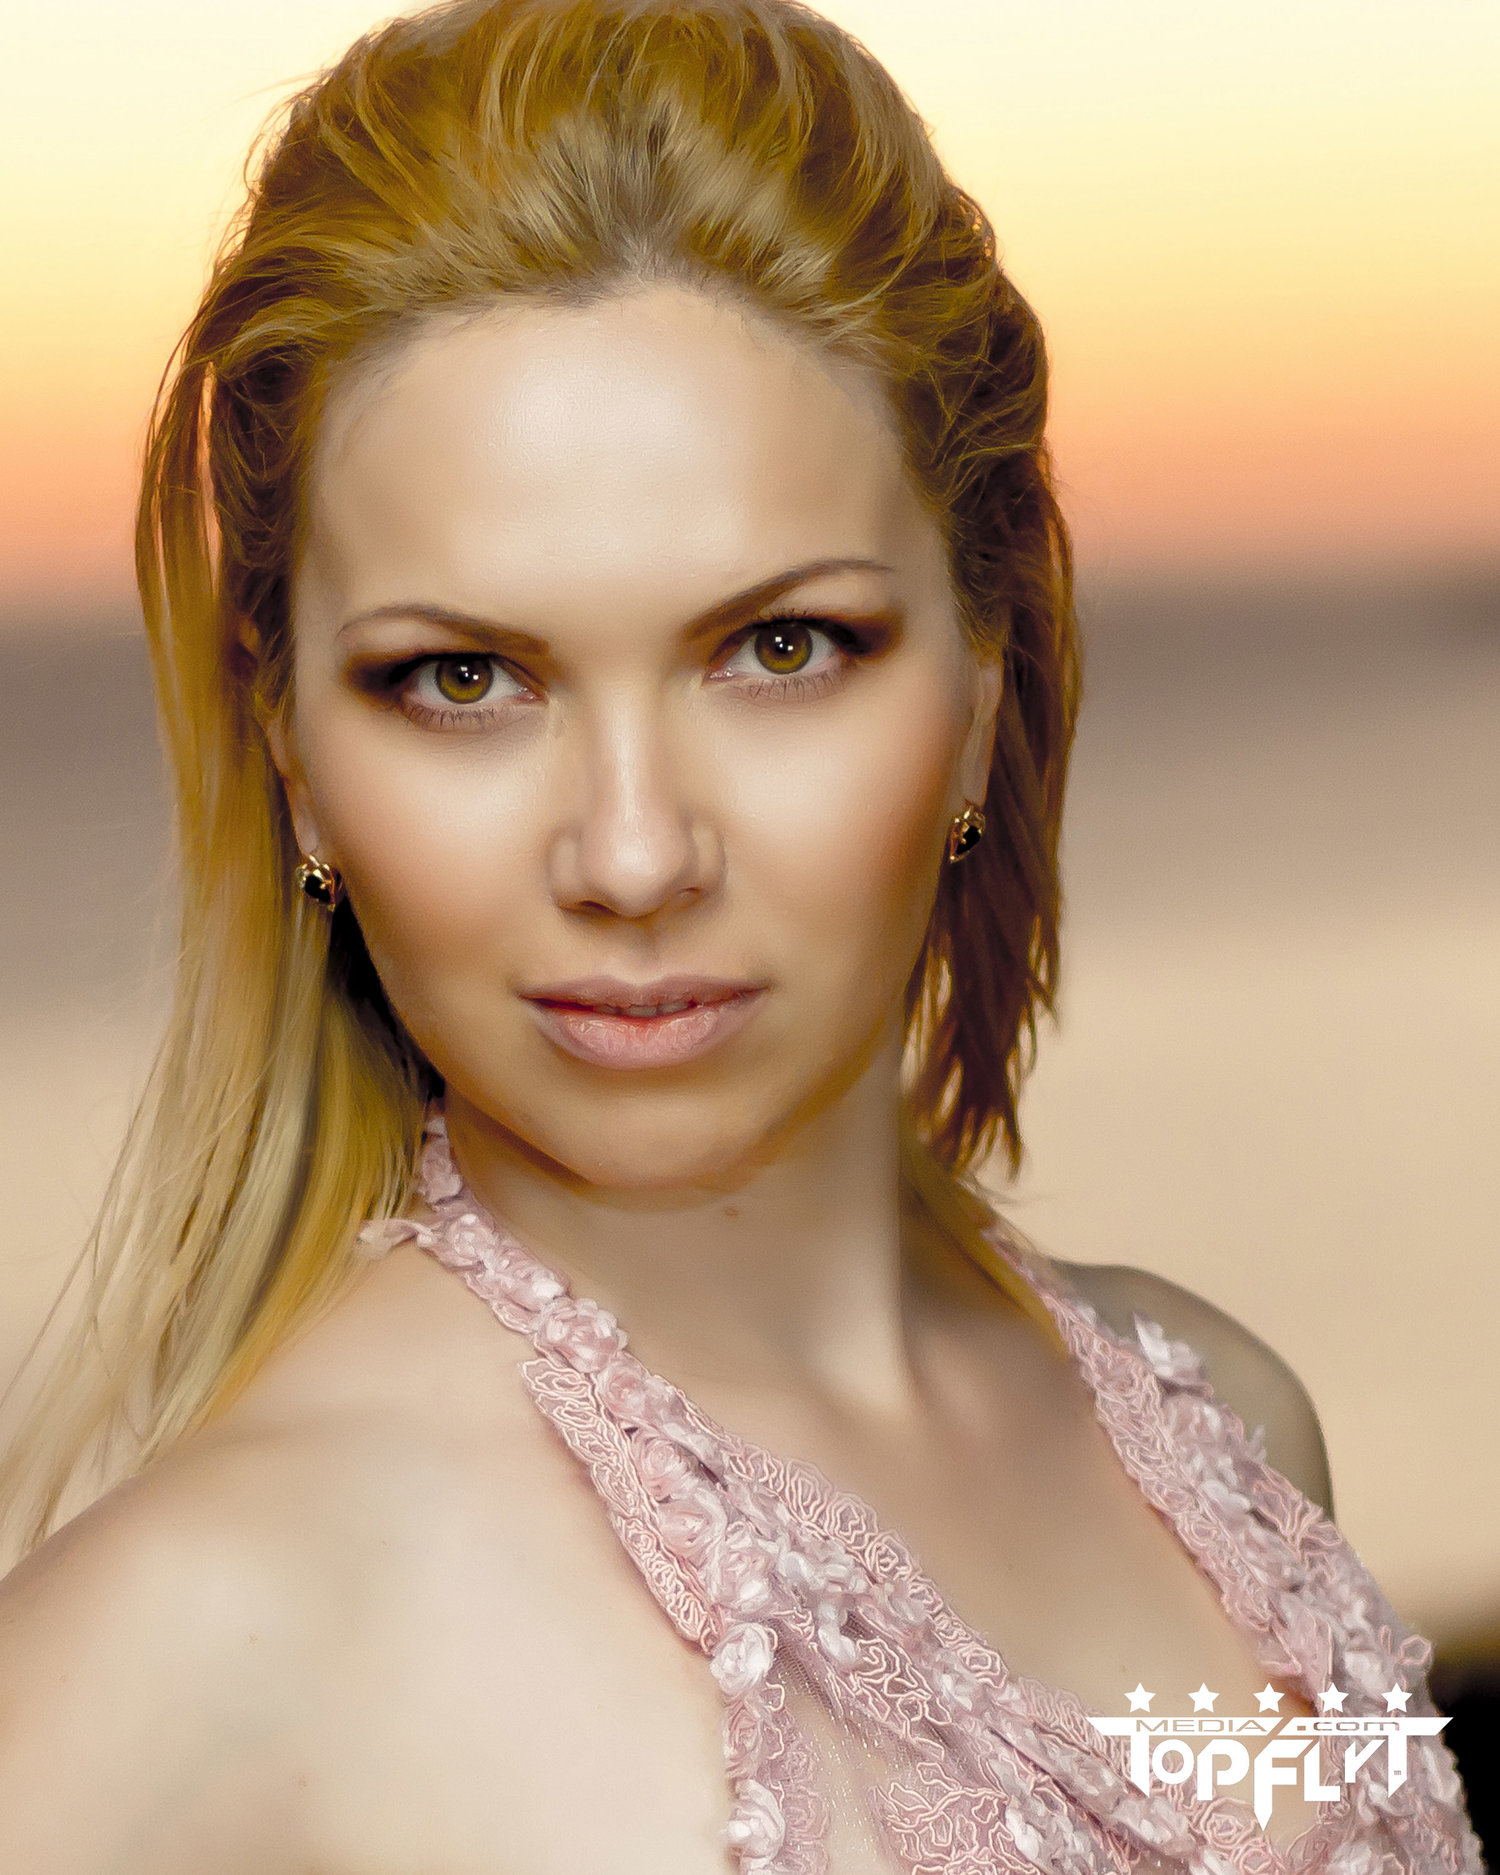 Prestigious Women's Getaway - Model HeadshotsPhotography, lighting and editing by Dumisani Maraire Jr. for 321Headshots.com